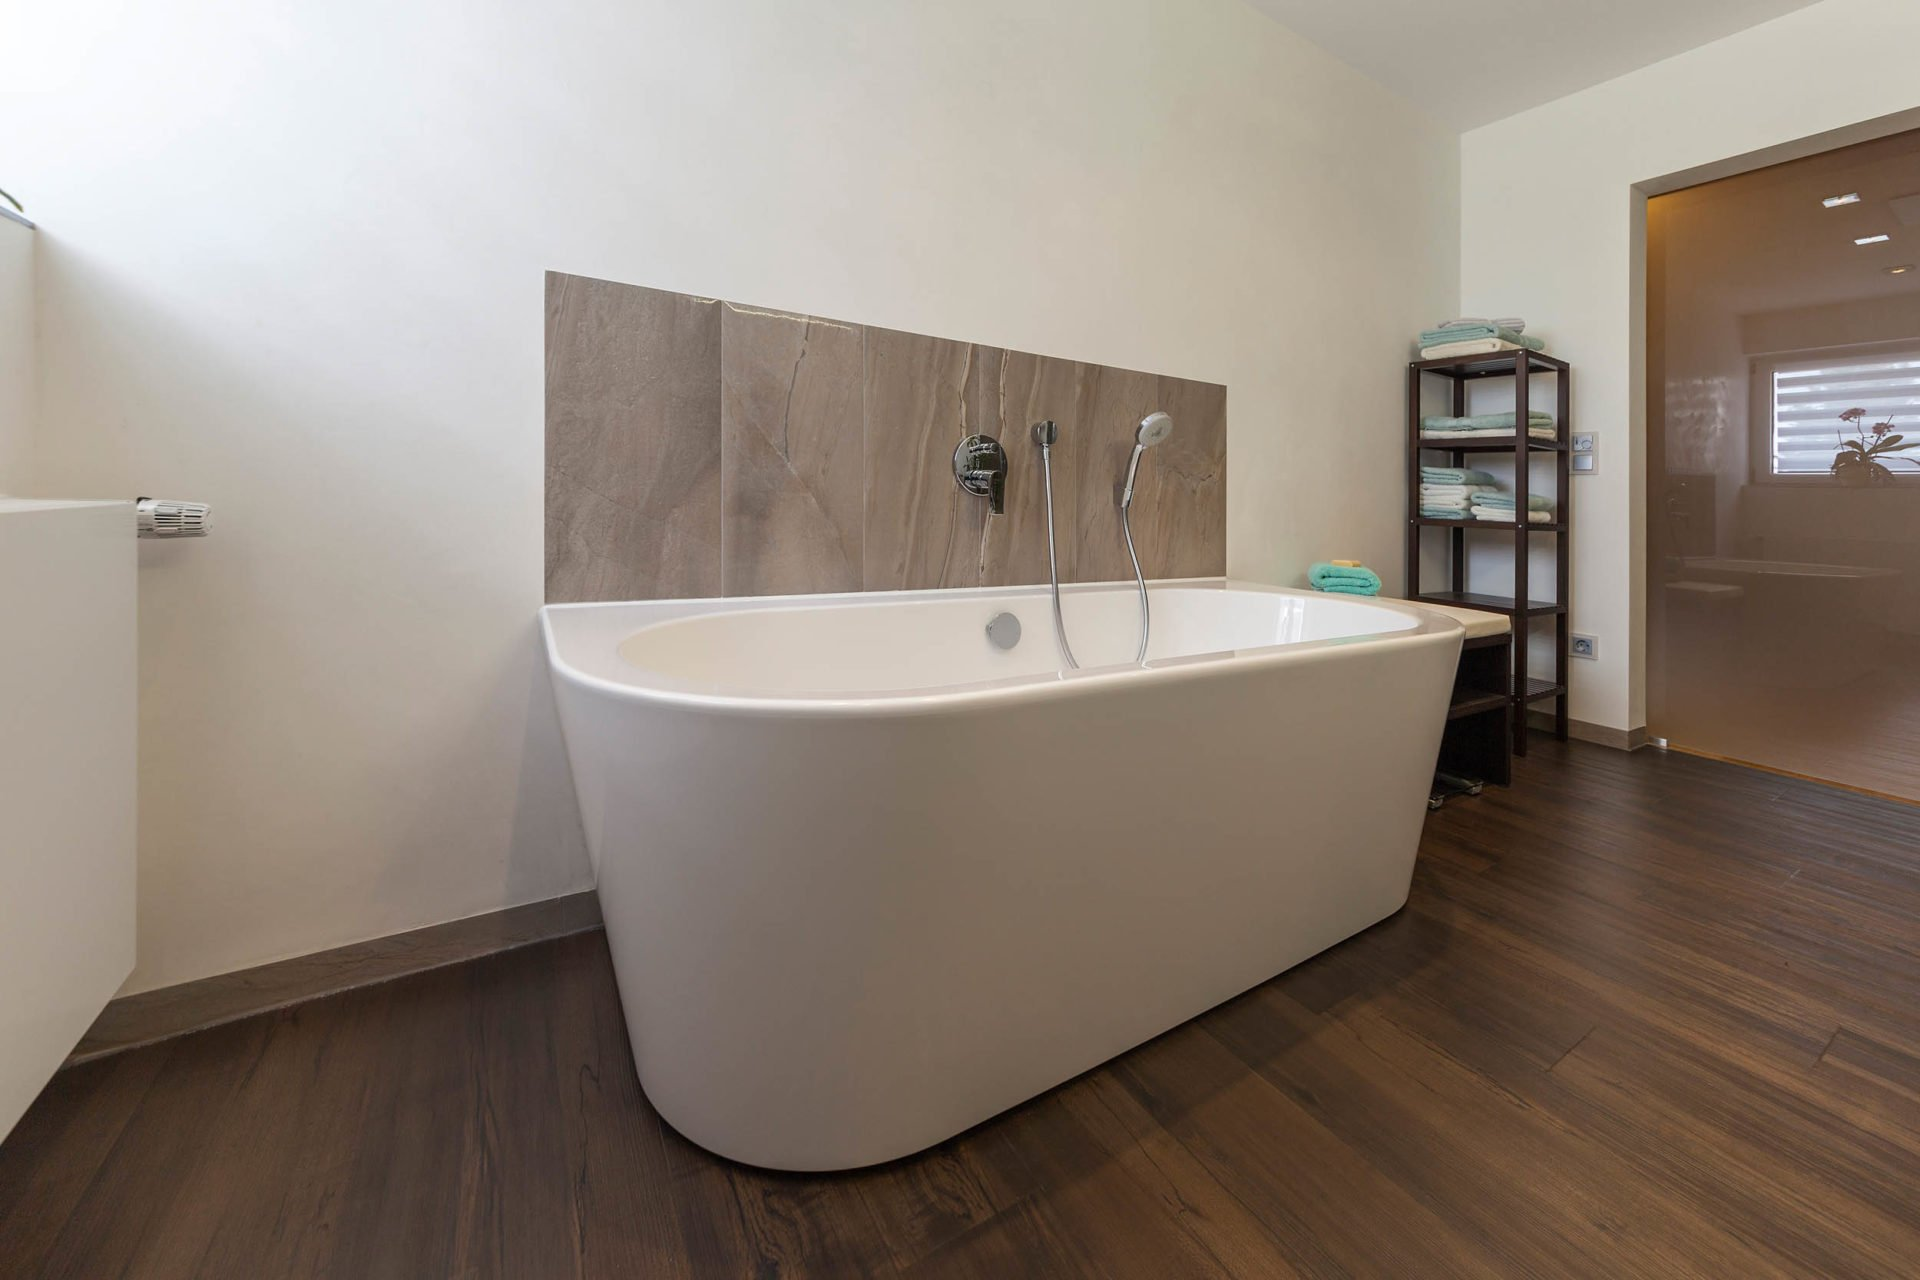 bad referenzbad marmor und holz freistehende badewanne. Black Bedroom Furniture Sets. Home Design Ideas